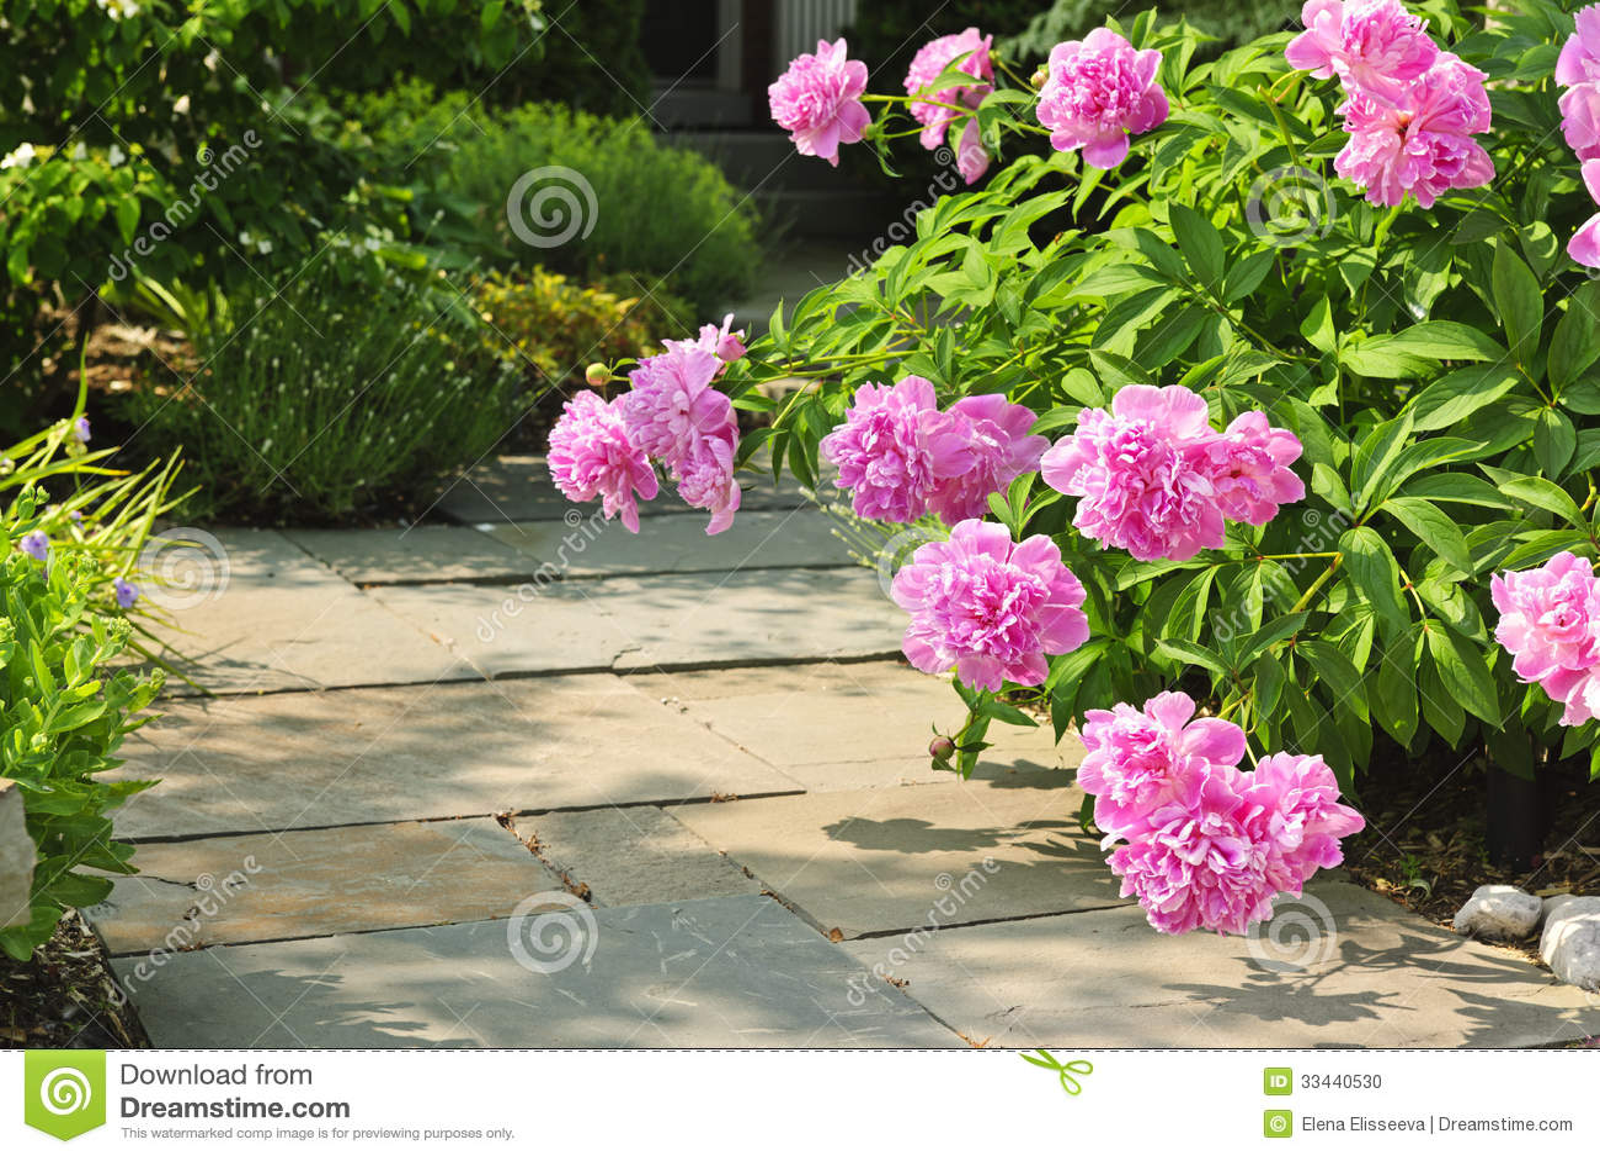 Jardin avec les pivoines roses photo stock image 33440530 for Jardin roses